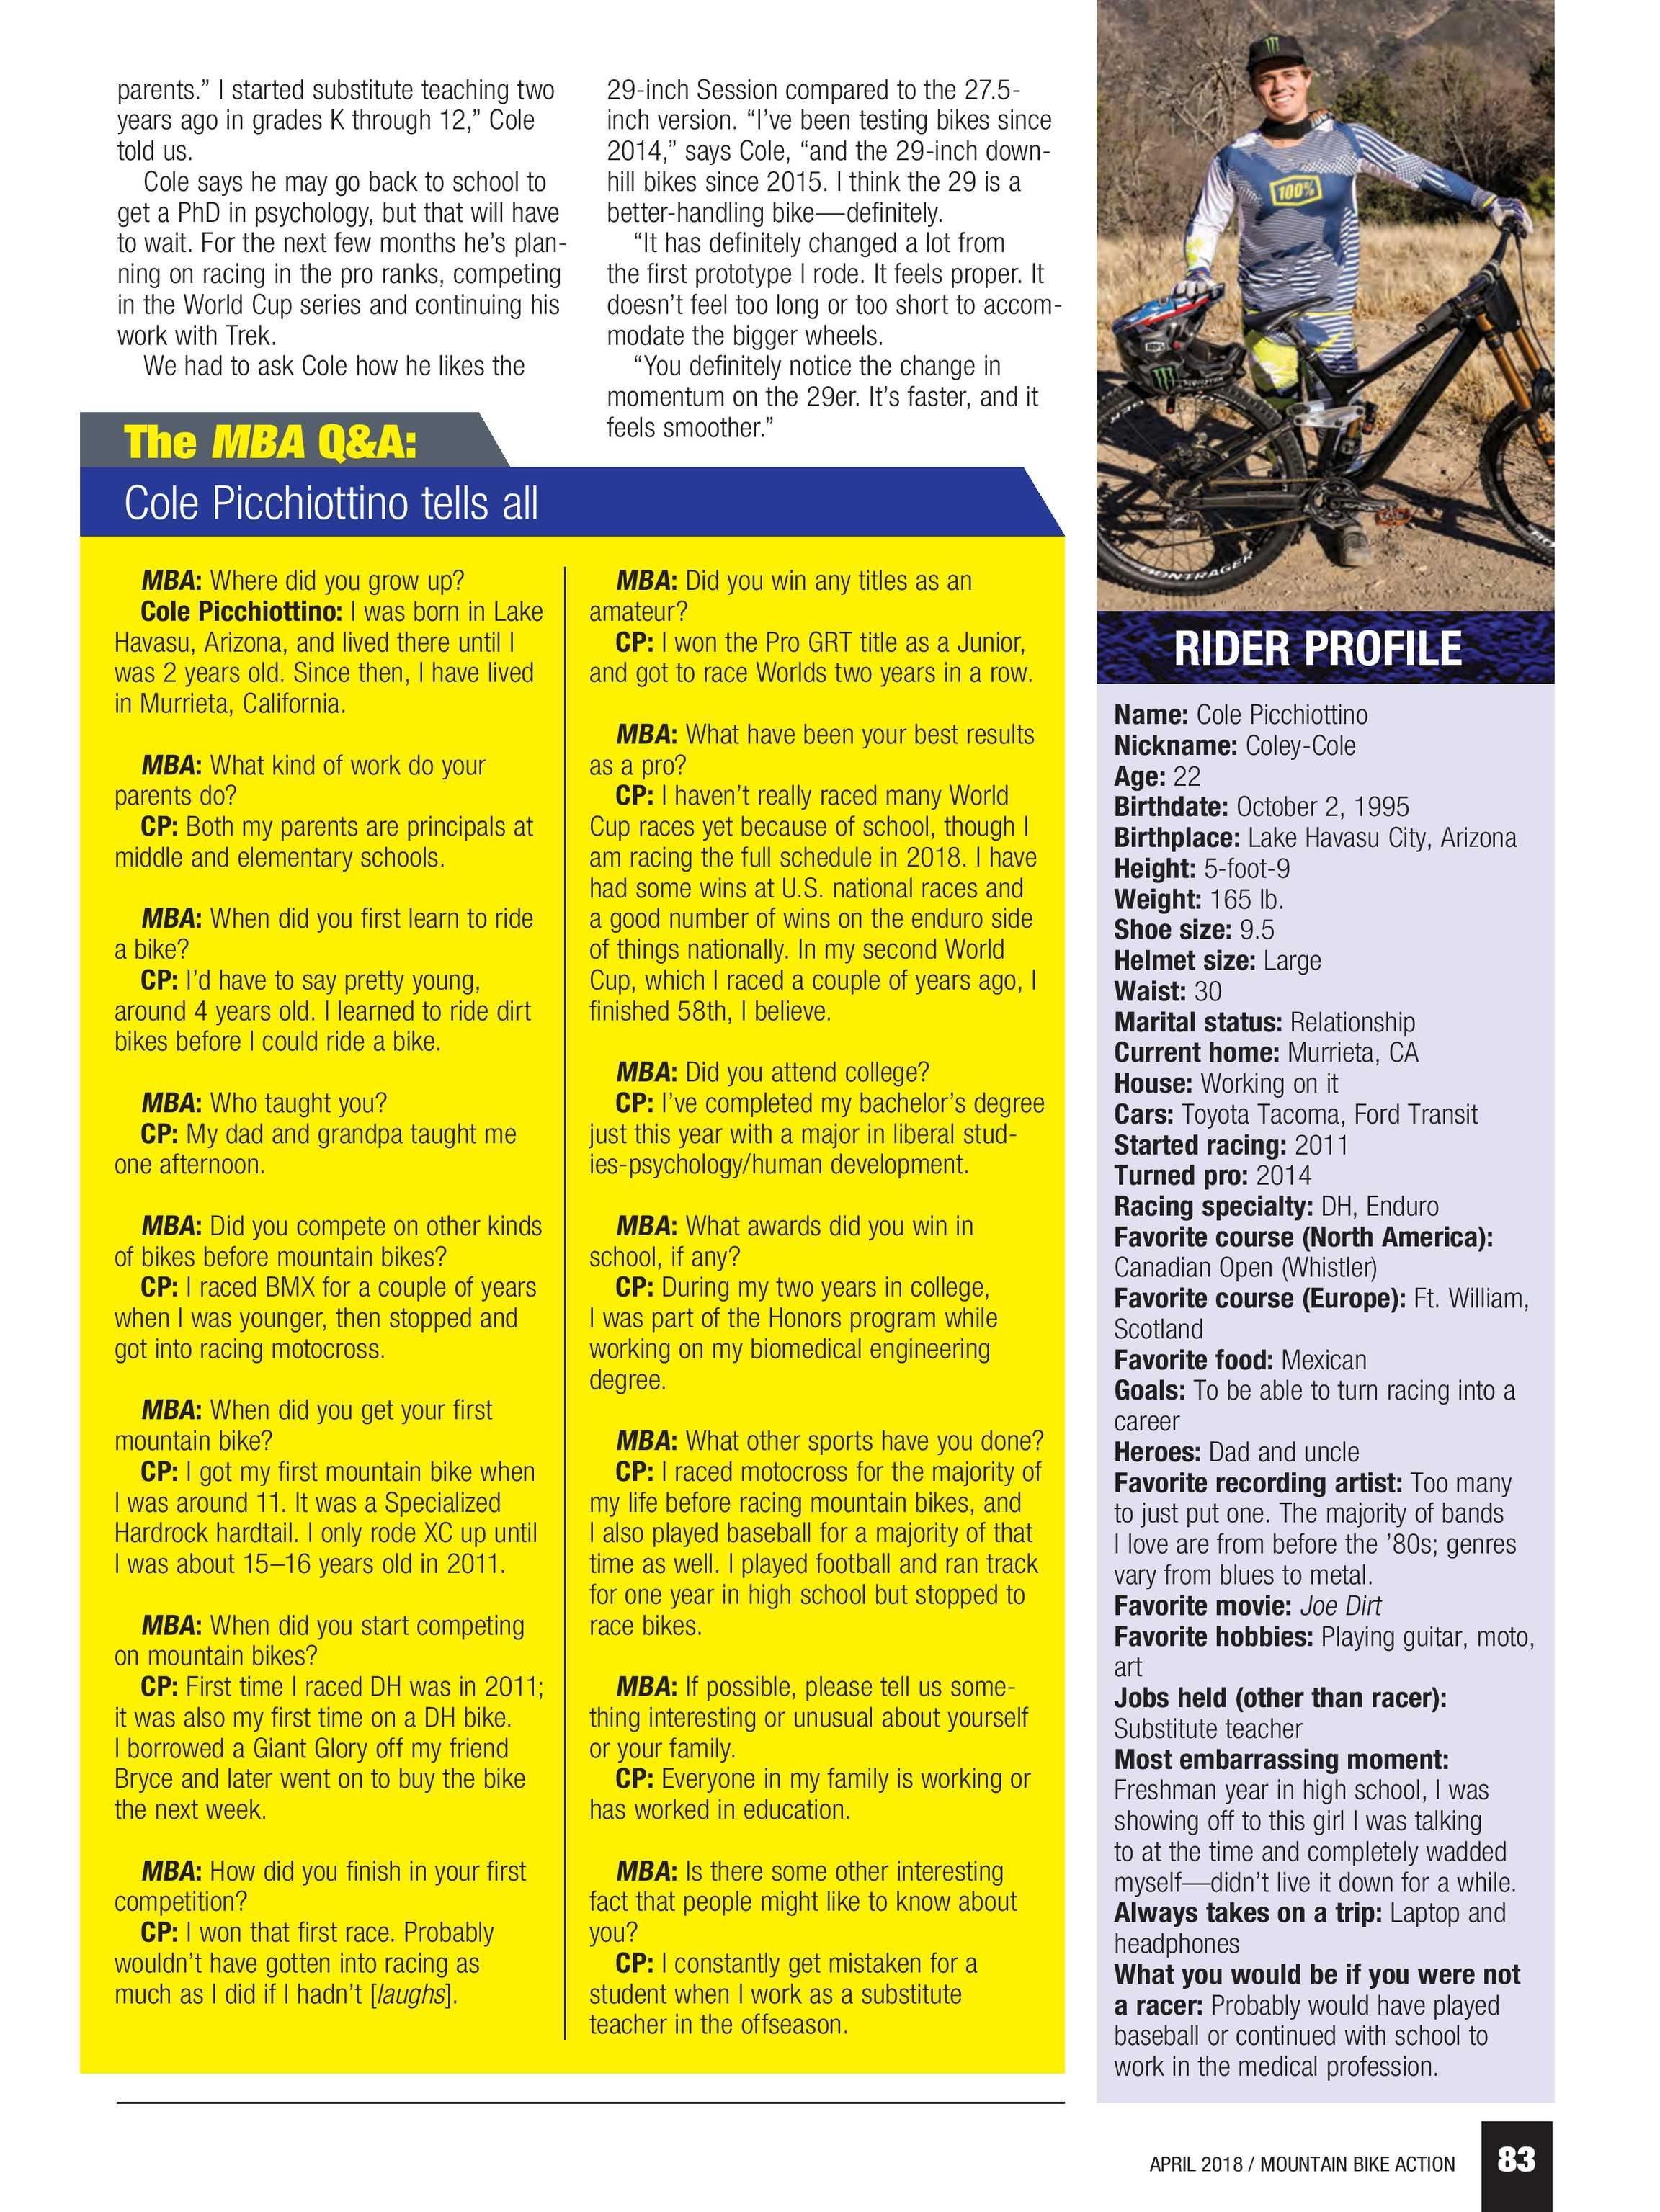 Mountain Bike Action - April 2018 - page 84